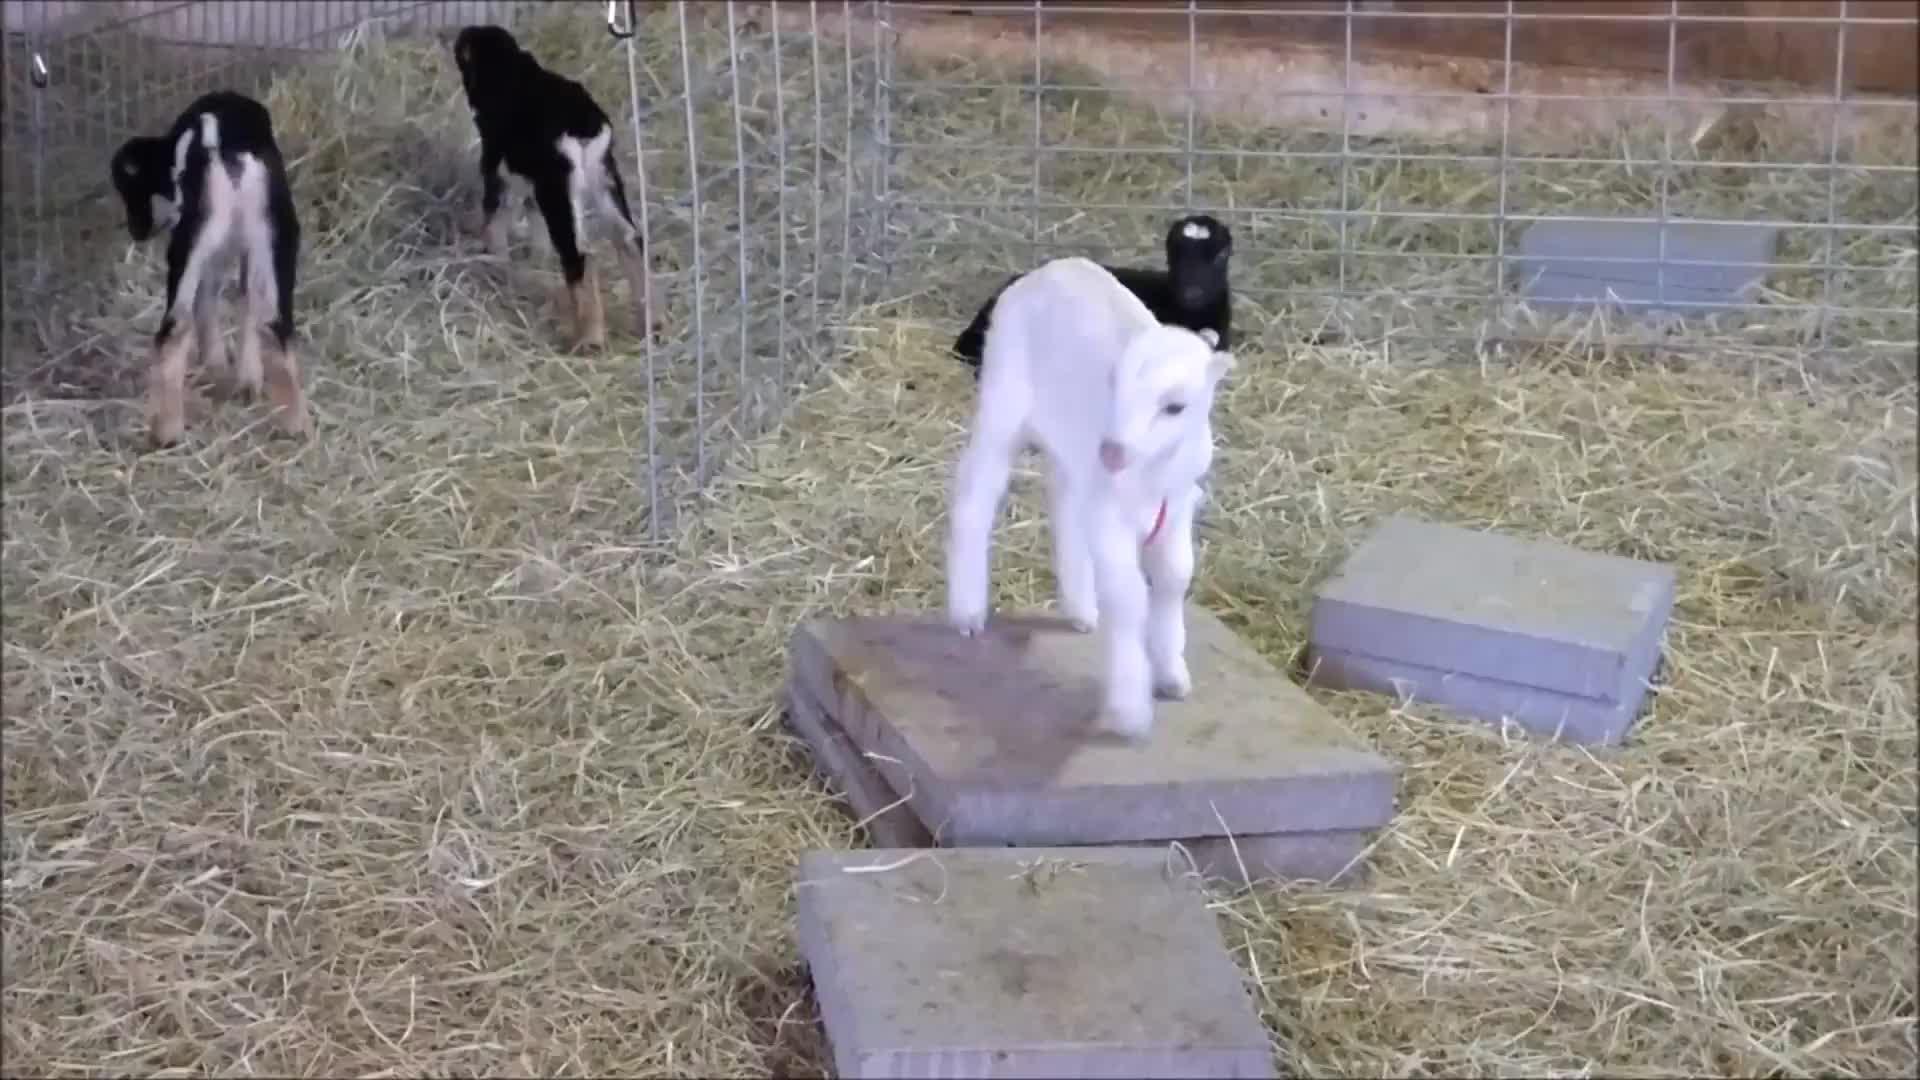 animal, animals, eyebleach, goat, goats, knsfarm, parkour, tippytaps, Not too happy! GIFs